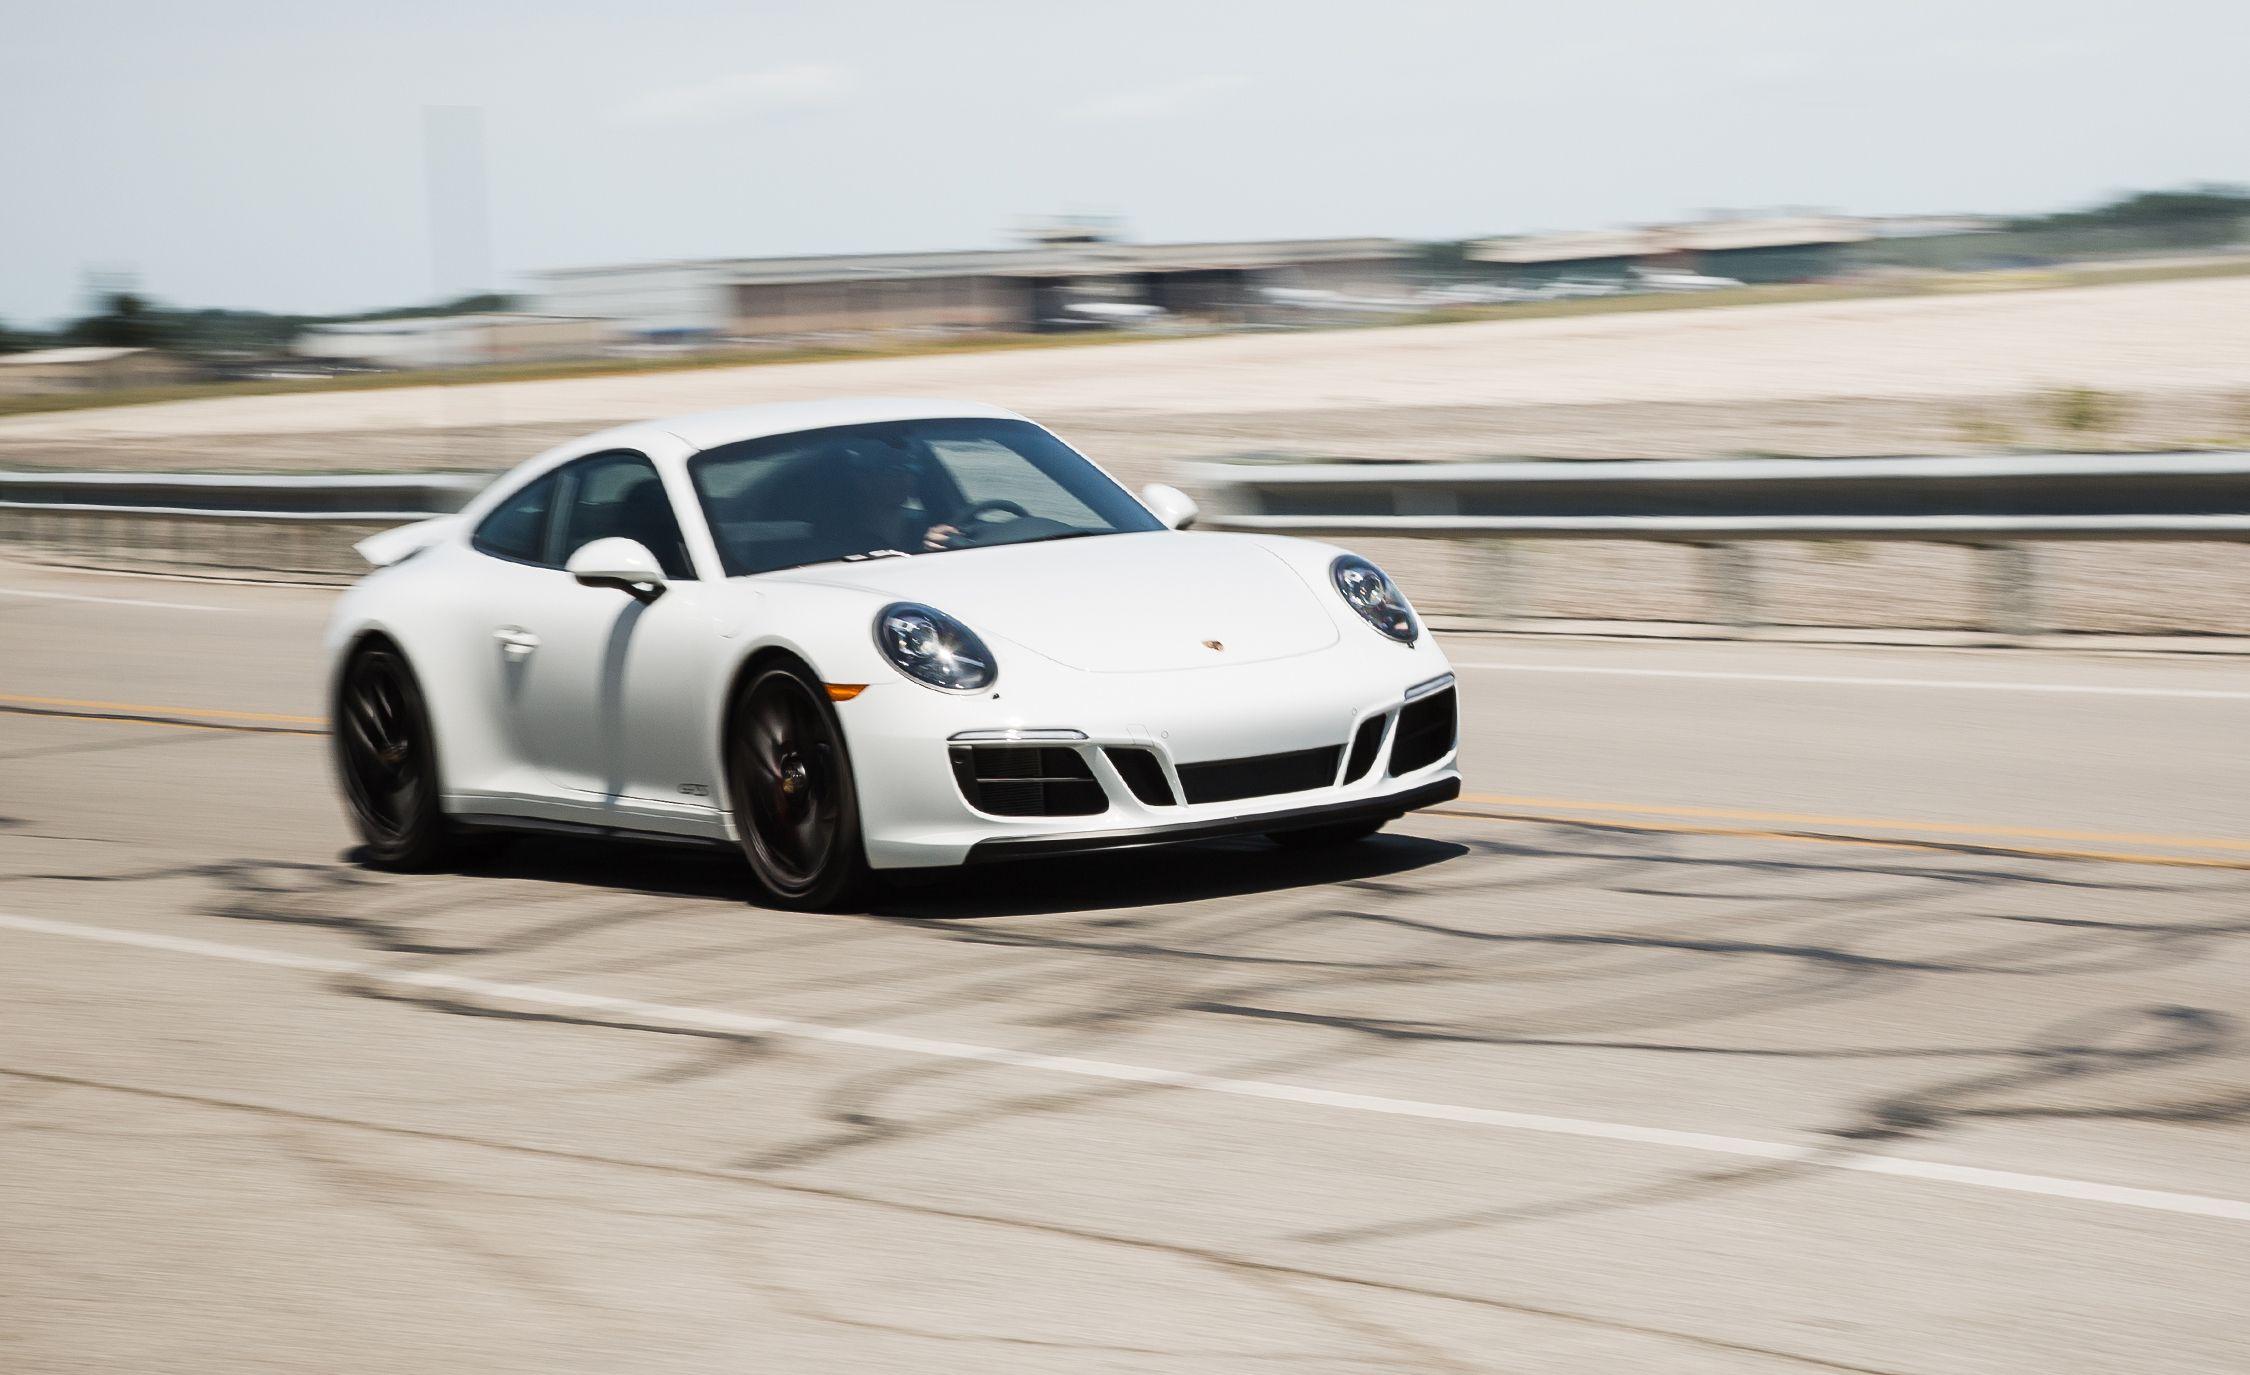 2017 Porsche 911 Carrera GTS PDK Automatic